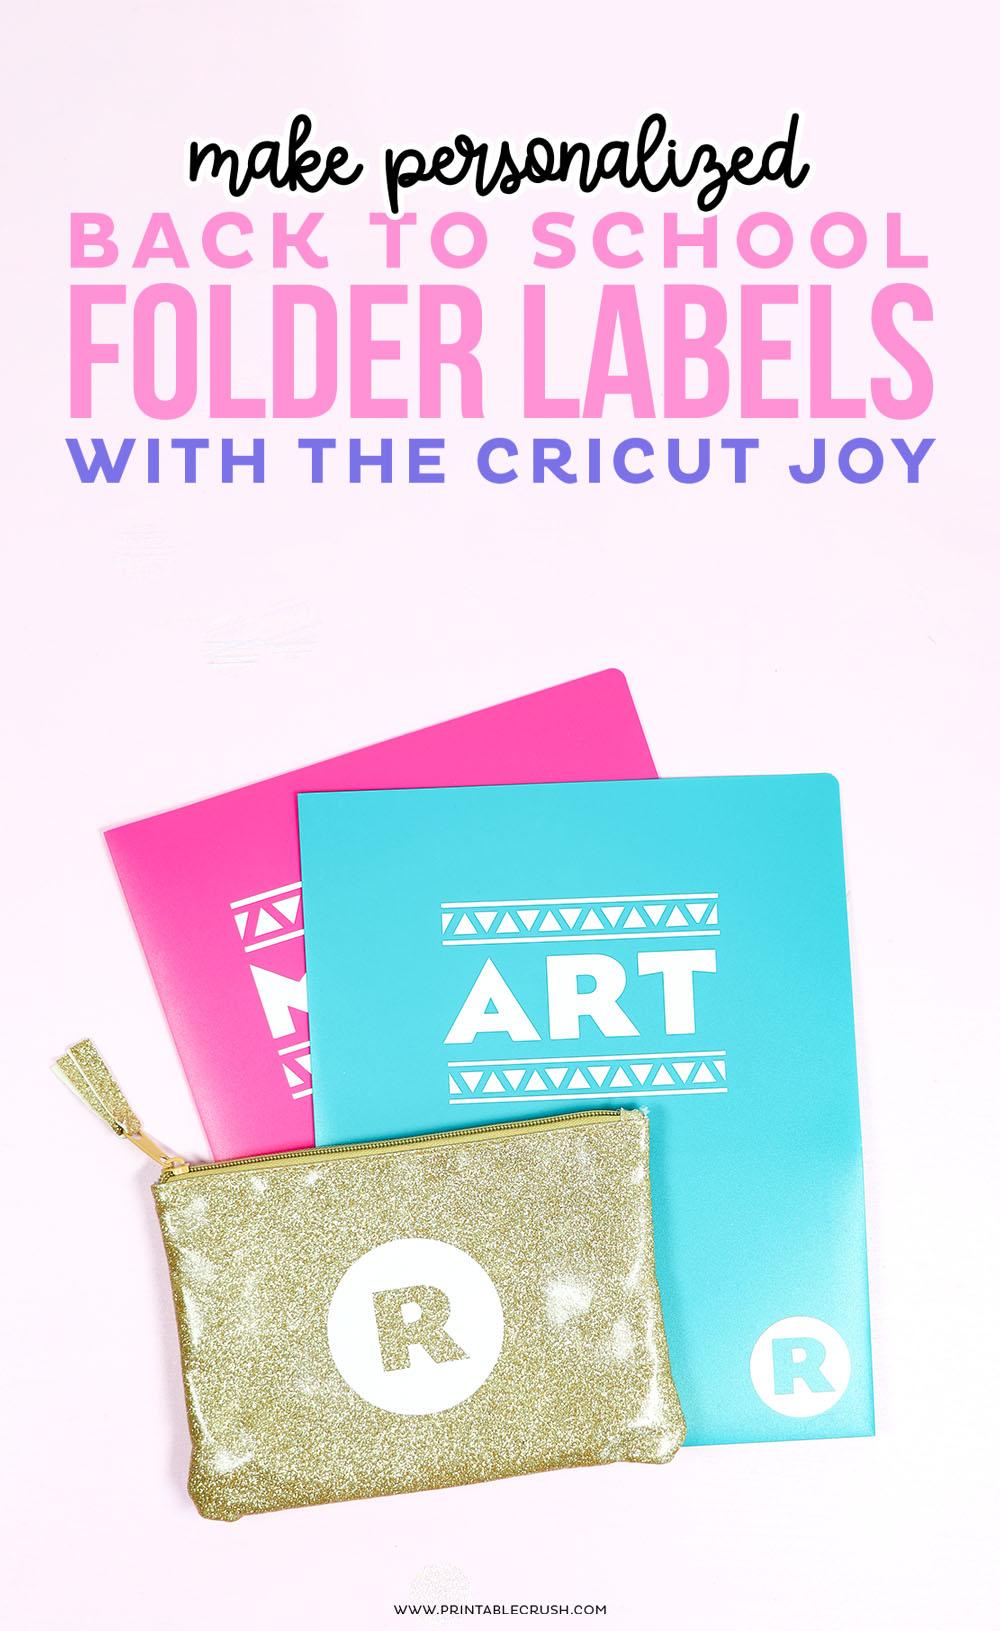 Cricut Joy Back to School Folders DIY - Printable Crush